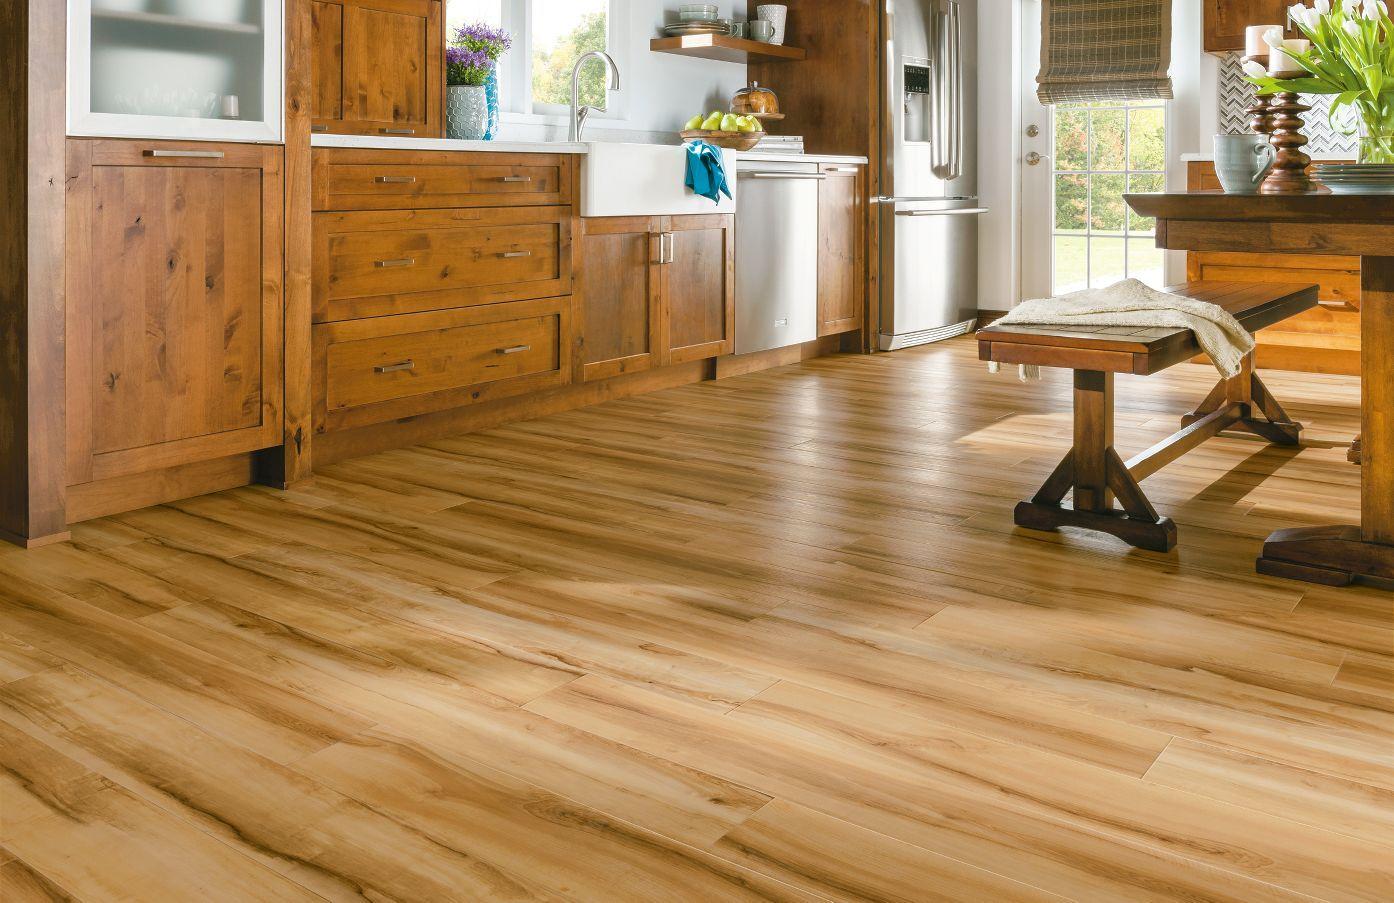 Armstrong Luxury Vinyl Plank Flooring Lvp Natural Wood Look Kitchen Dining Ideas